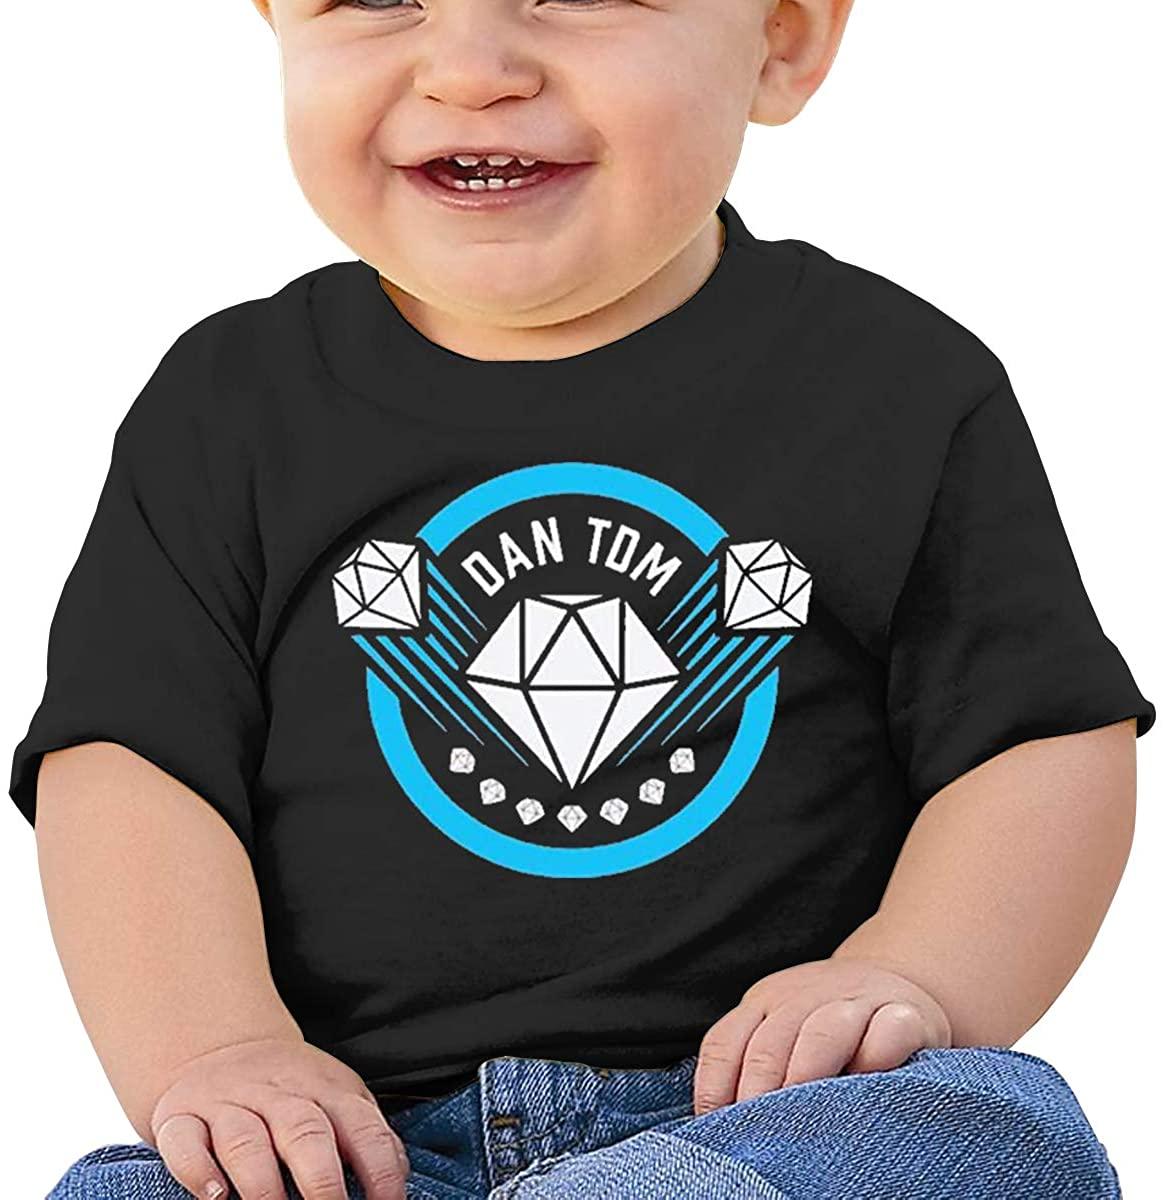 6-24 Months Boy and Girl Baby Short Sleeve T-Shirt Dantdm Original Minimalist Style Black